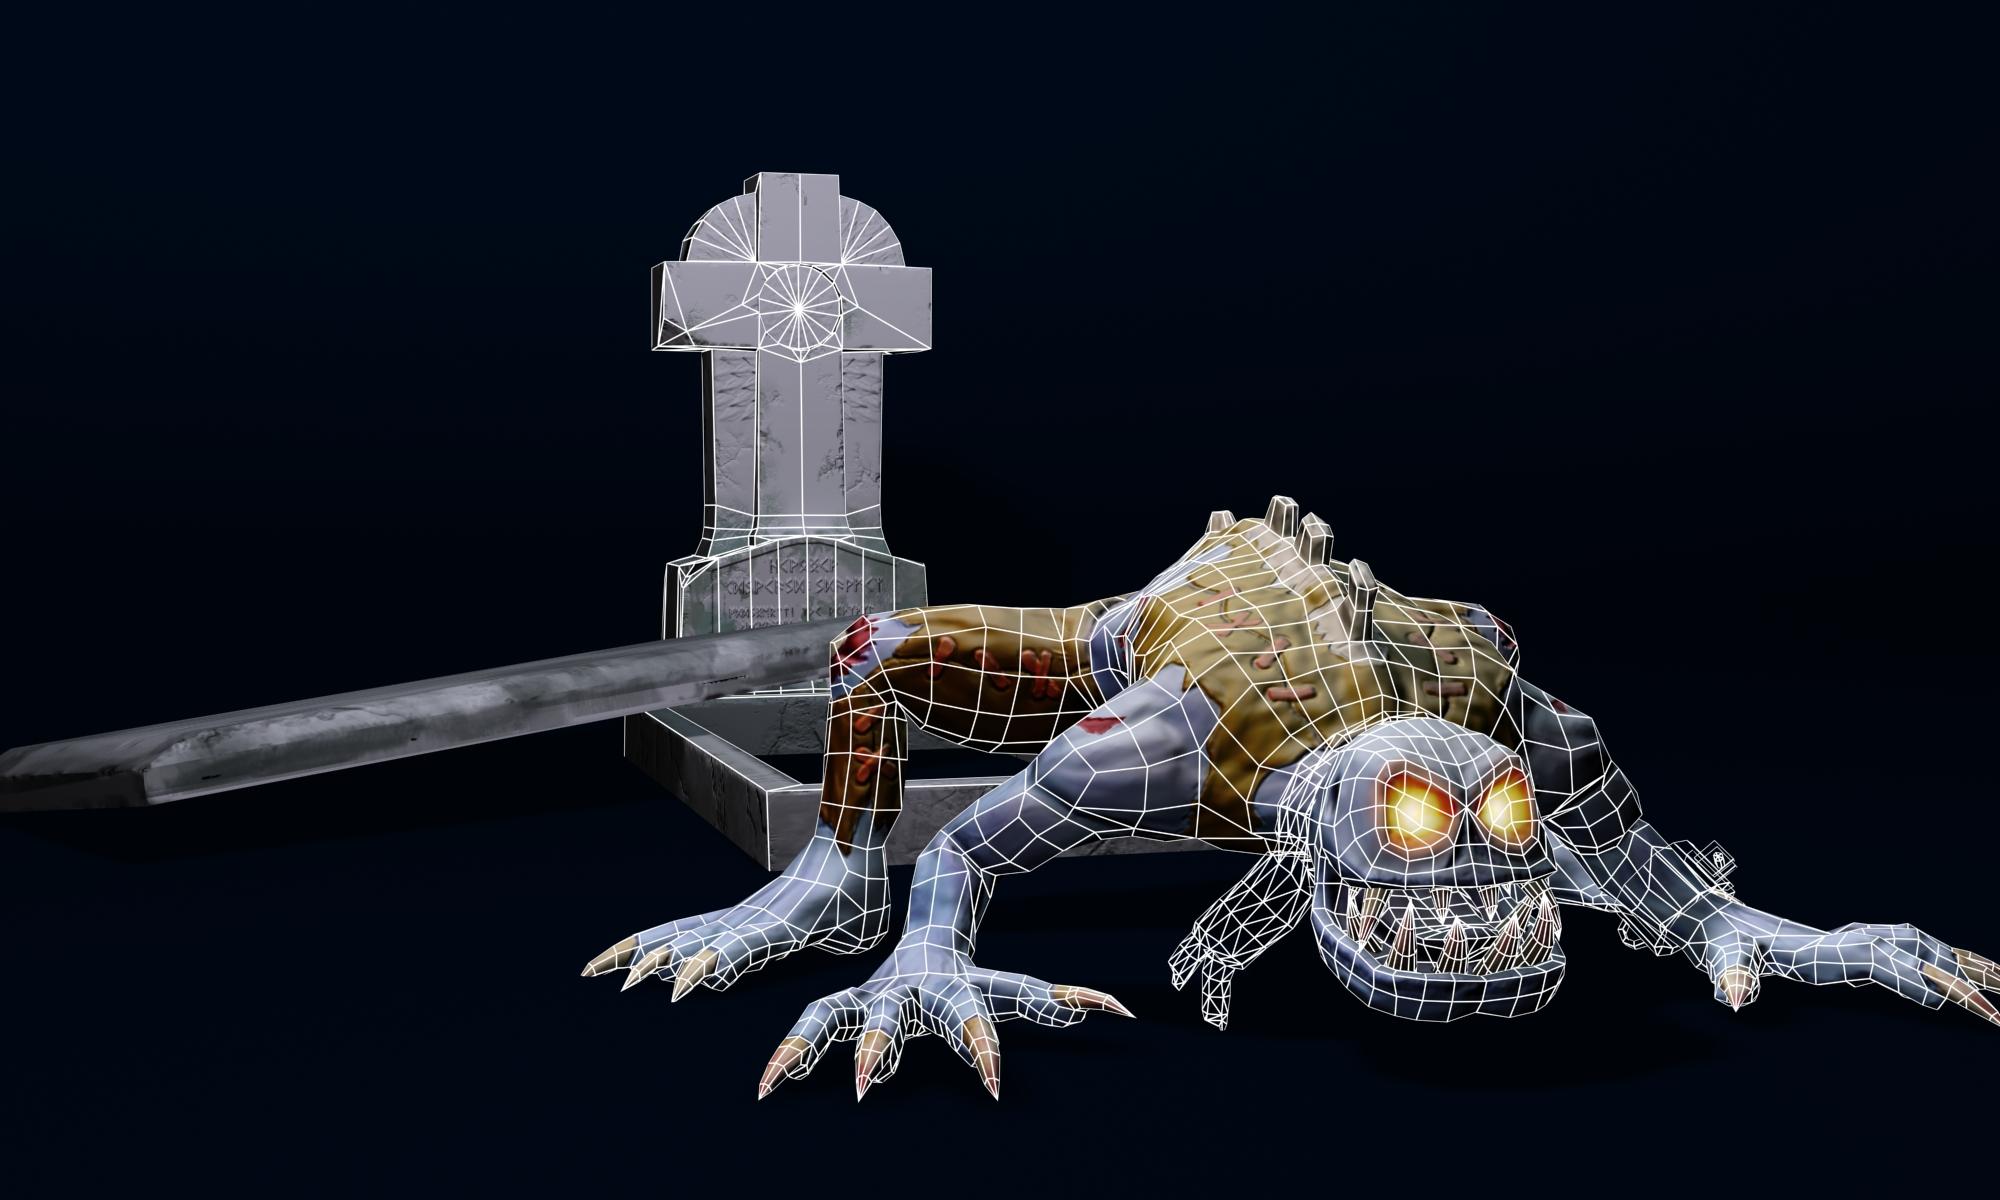 zombi (ghoul) 3d model max fbx obj 212442